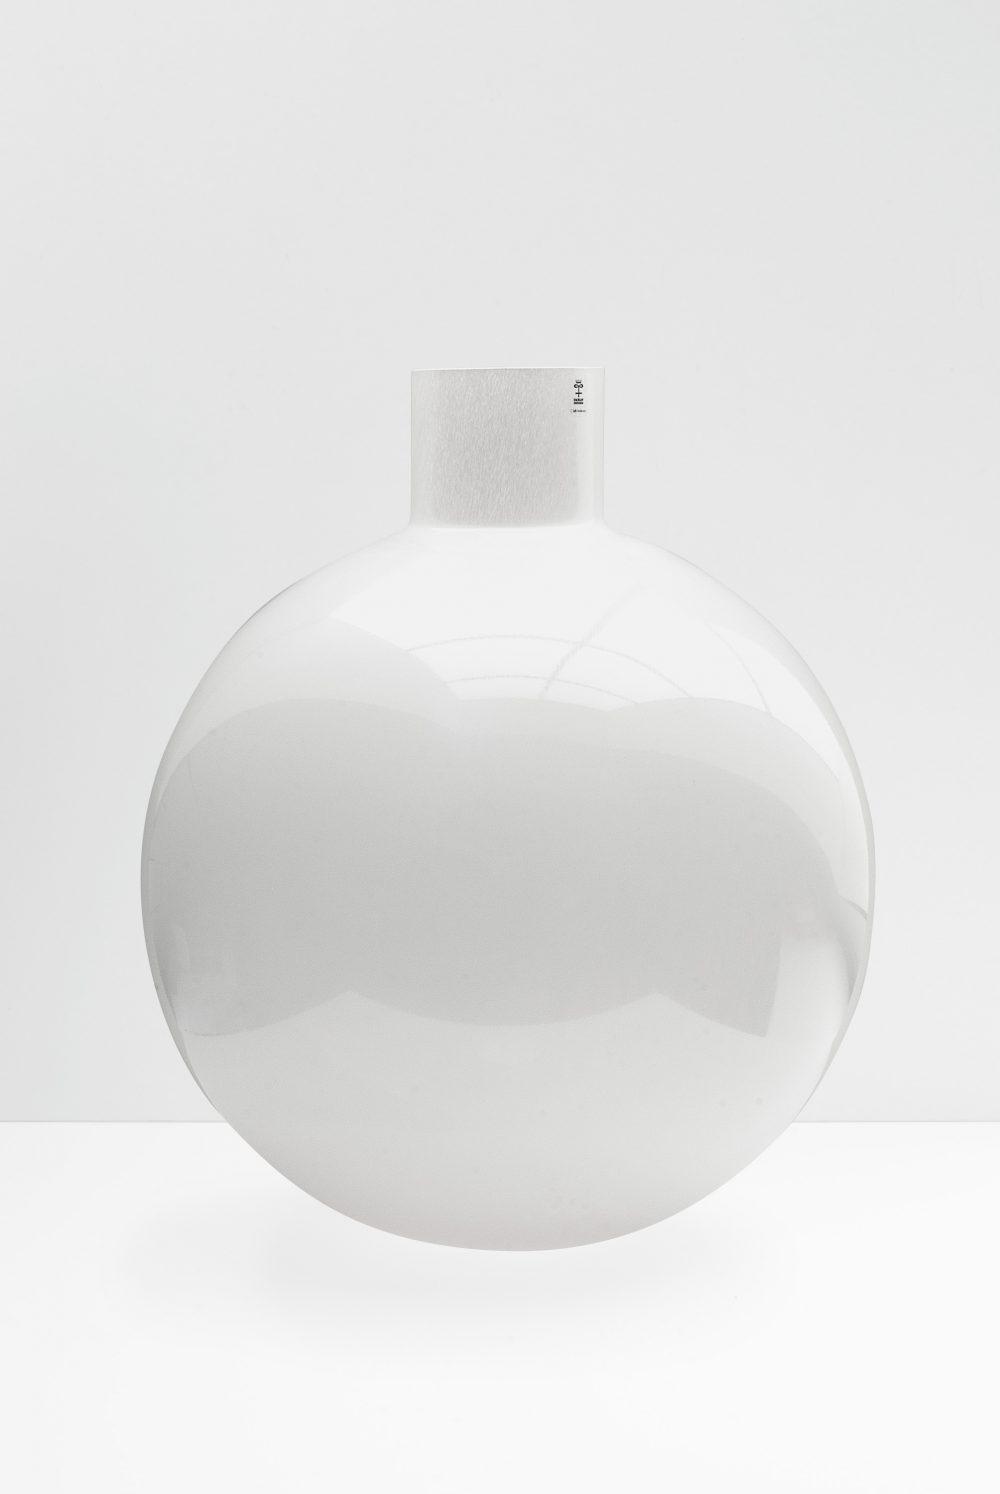 Large Pallo in Shiny White